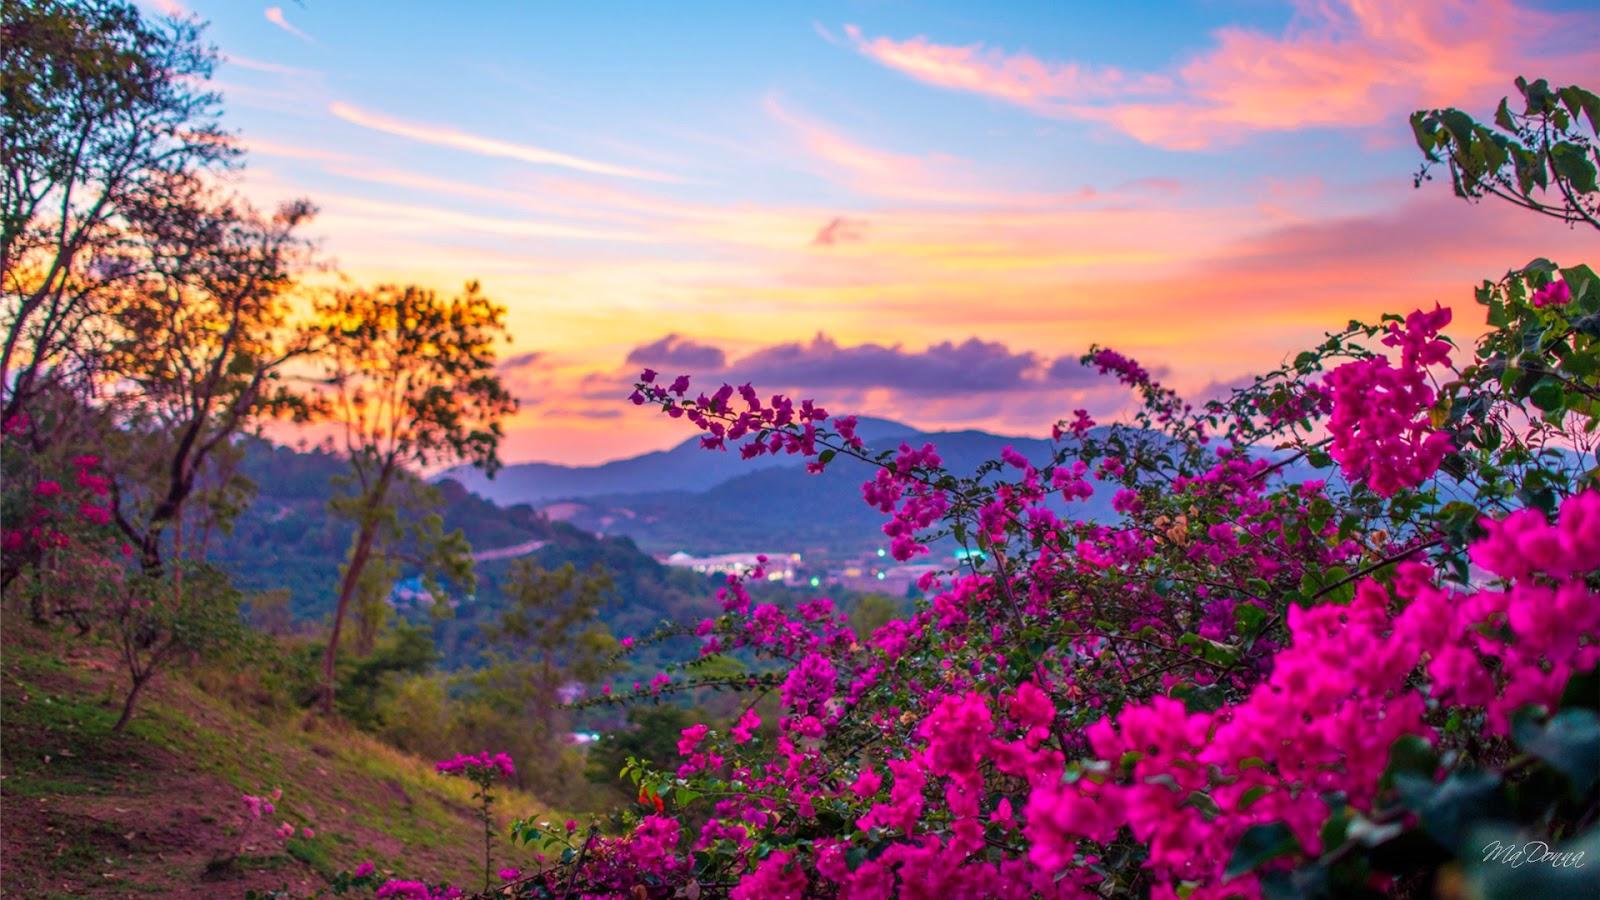 Spring Season HD Desktop Wallpaper 2015 HD Spring Season Desktop 1600x900